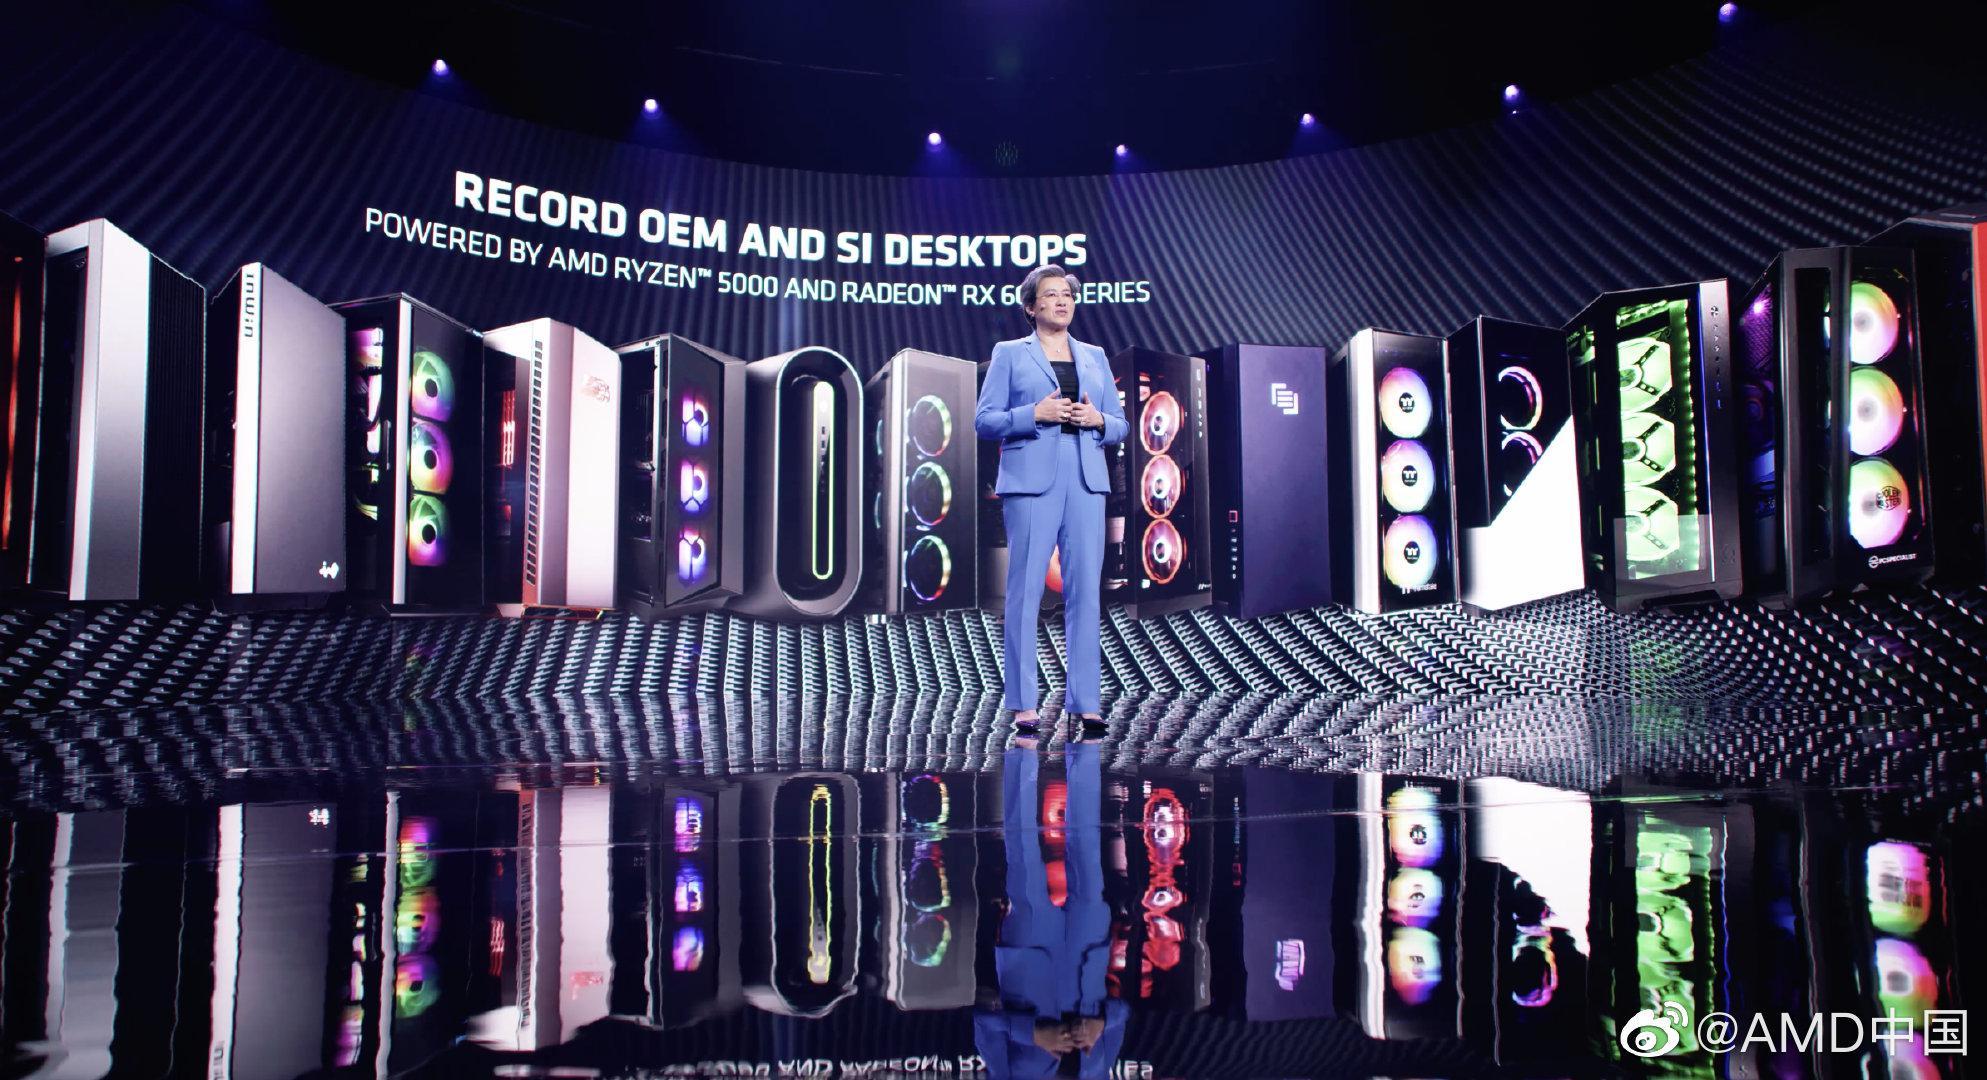 AMD CES 盘点:今年上半年发布首批采用 RDNA2 显卡的笔电,主流台式机显卡也将推出